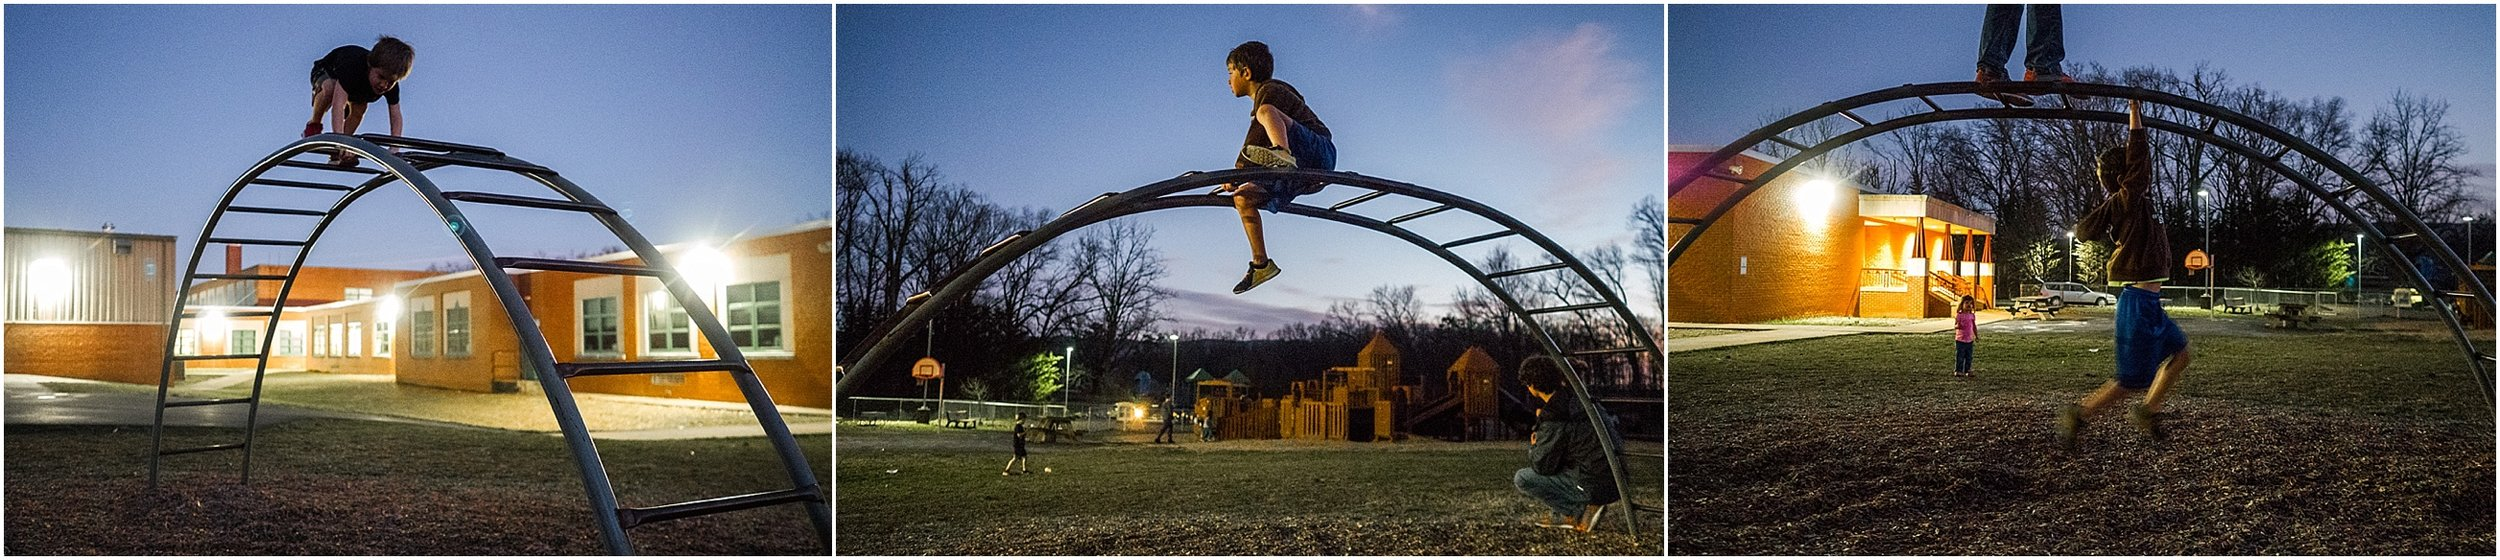 Guy K Stump Elementary playground